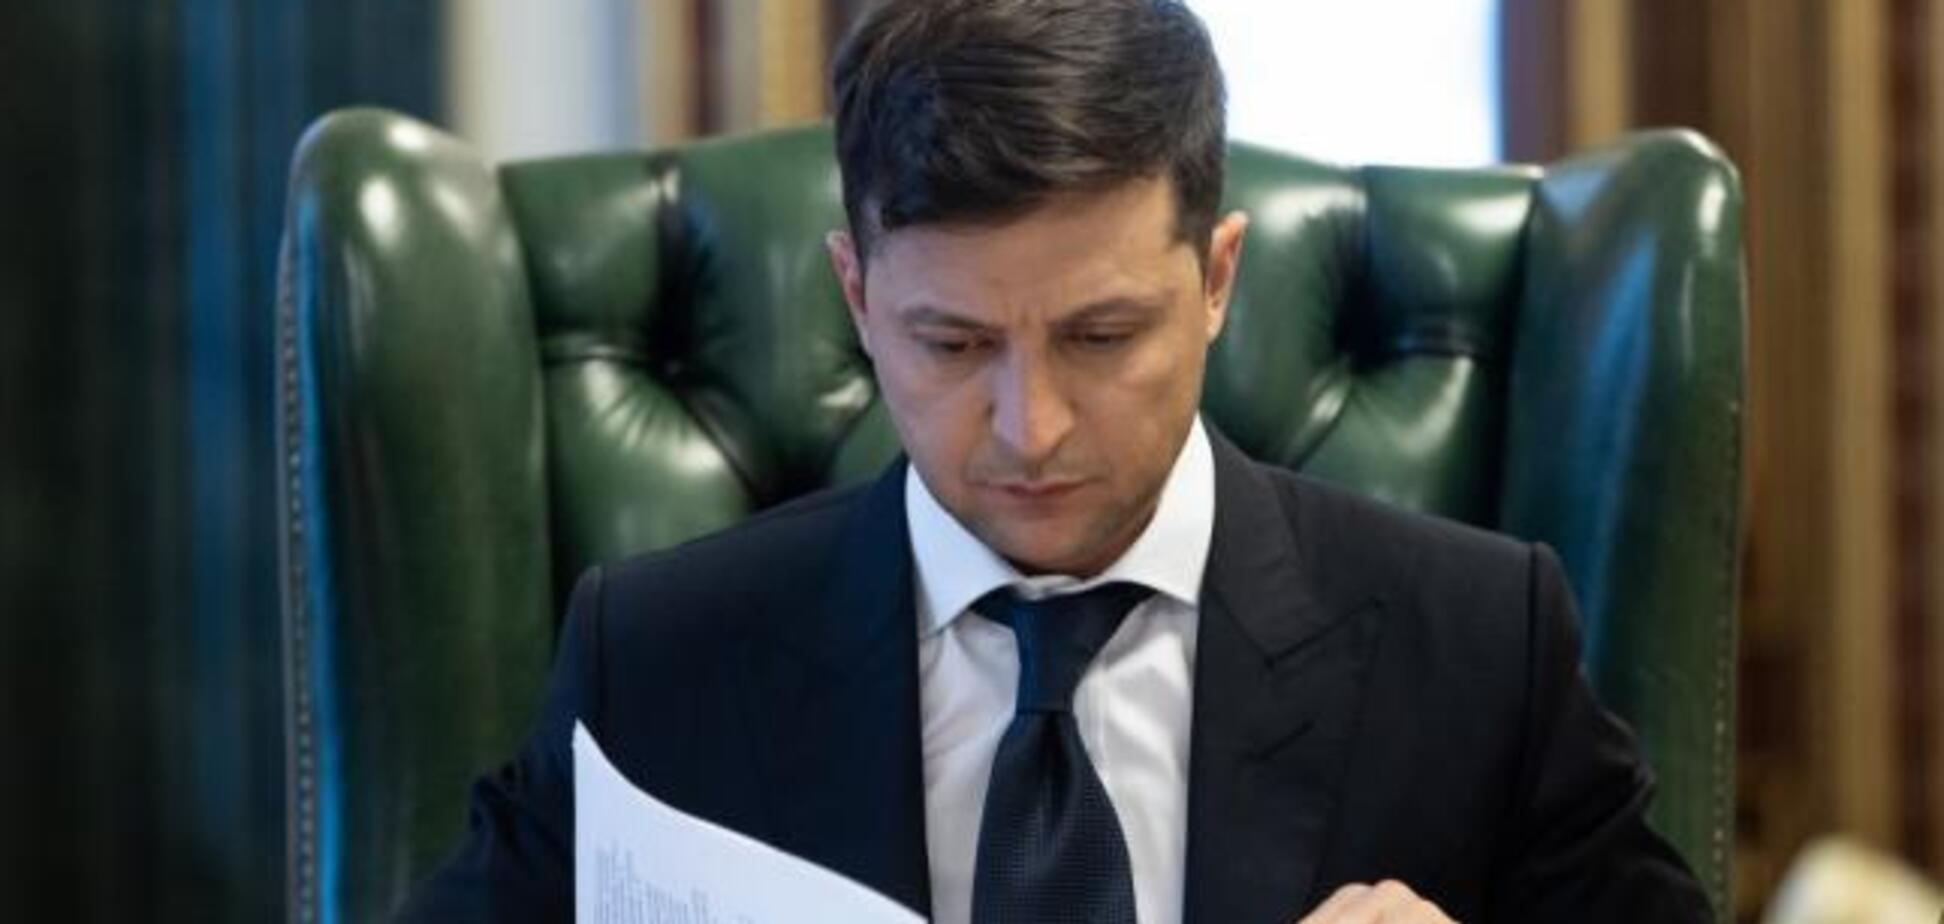 Зеленский провел перестановки в СНБО: кого назначил